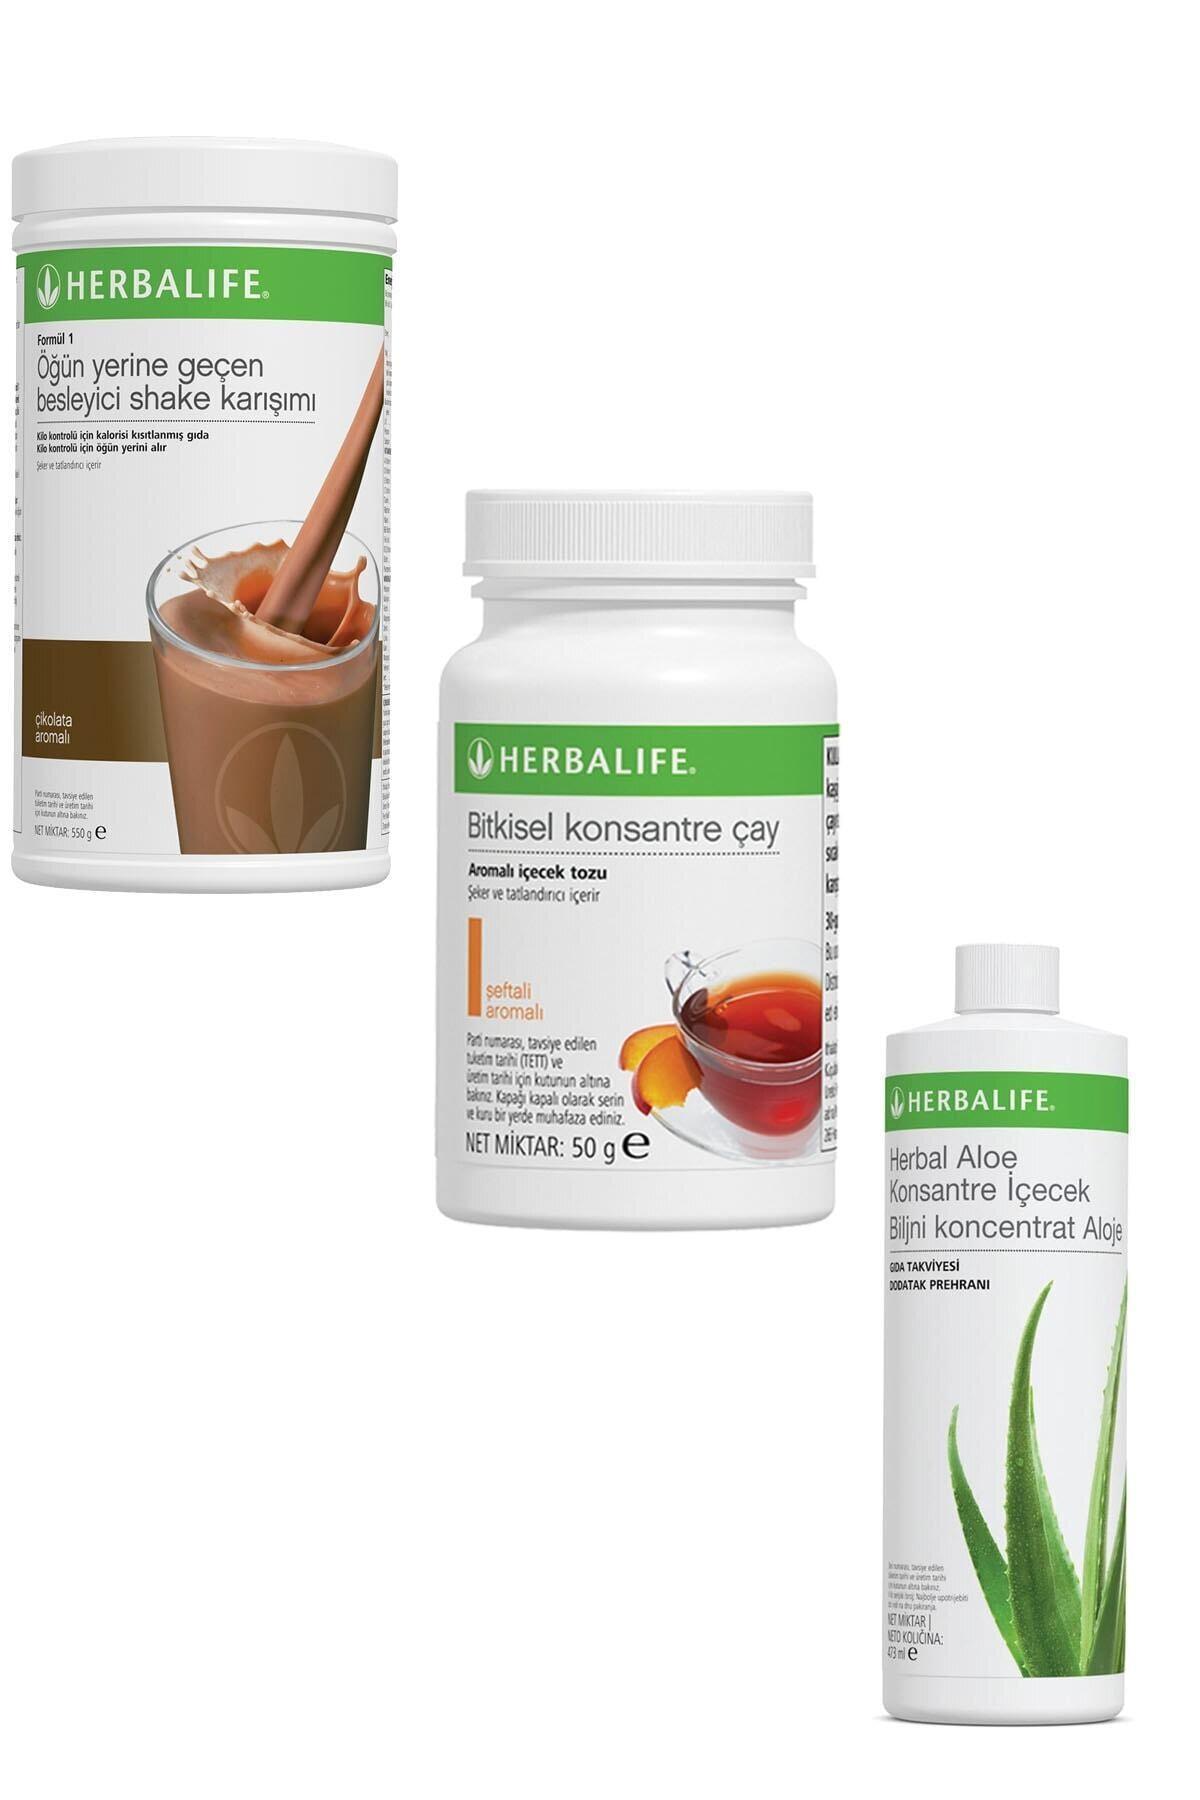 Herbalife Shake 1 Adet Çikolatalı 1 Adet Şeftali Çay 50 gr 1 Adet Ve 1 Adet Herbal Aloe Içecek 1